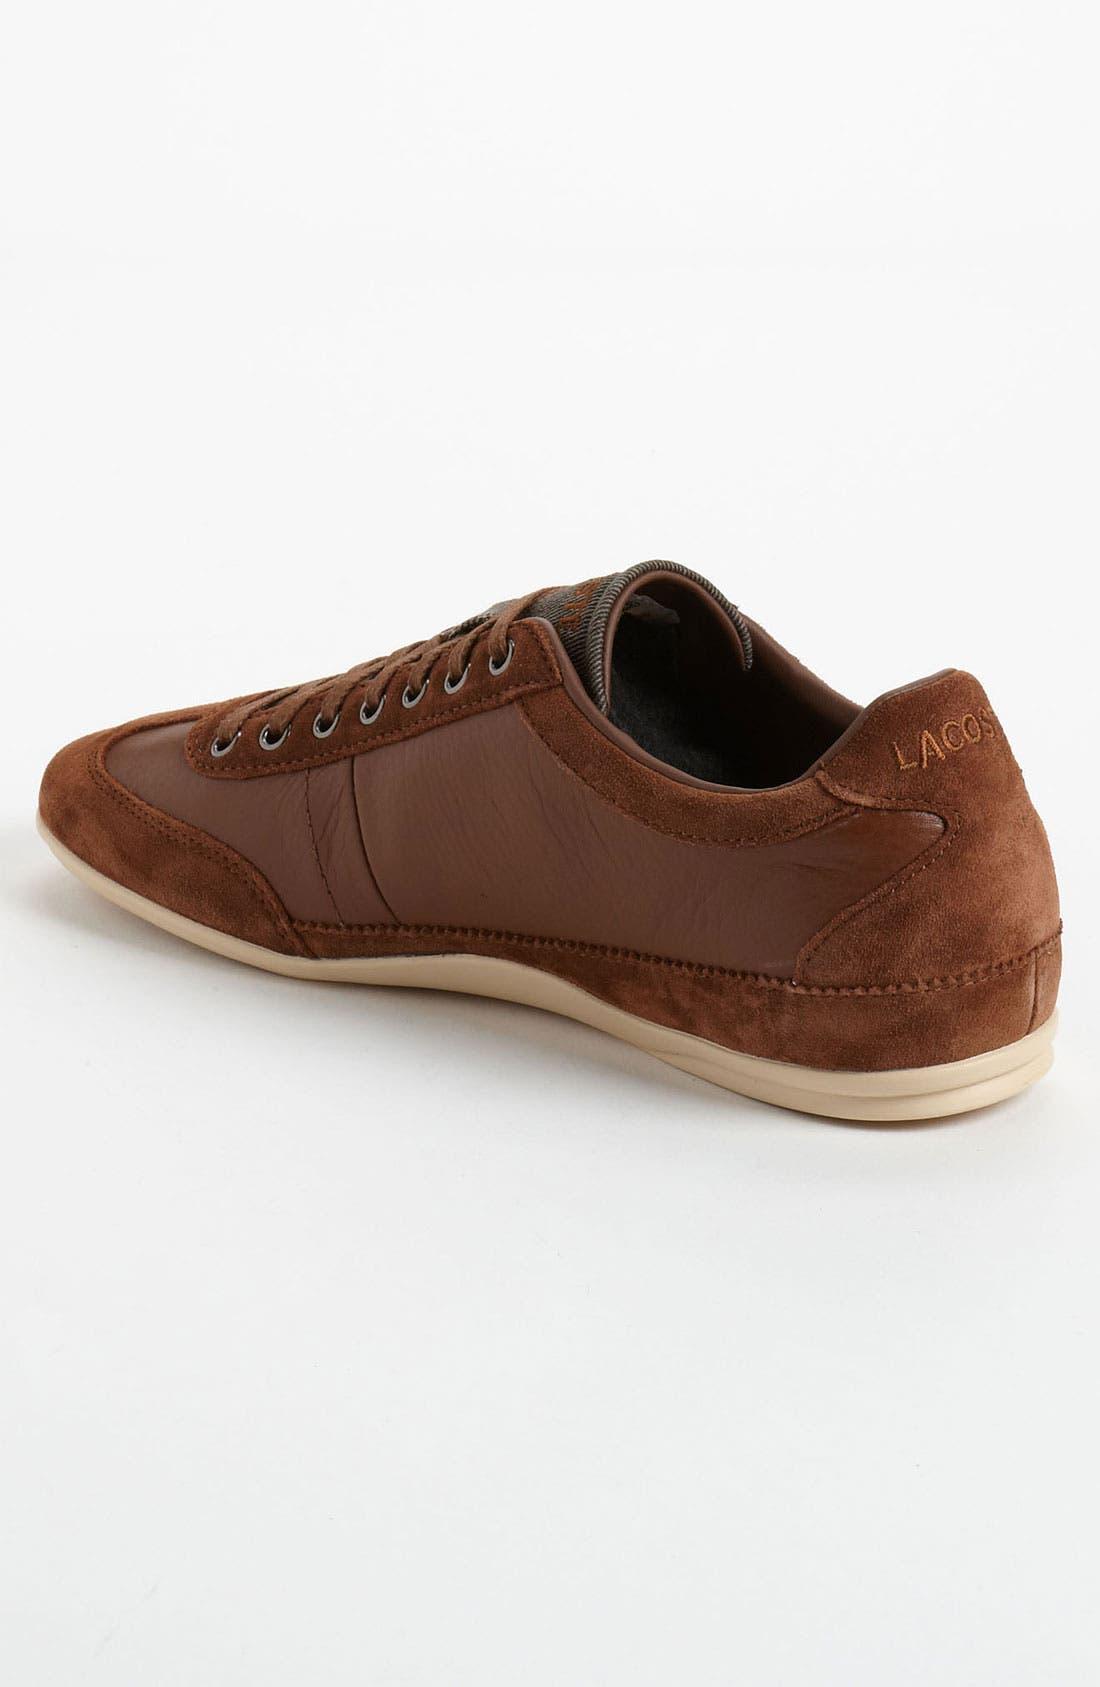 Alternate Image 2  - Lacoste 'Misano 19' Sneaker (Men)